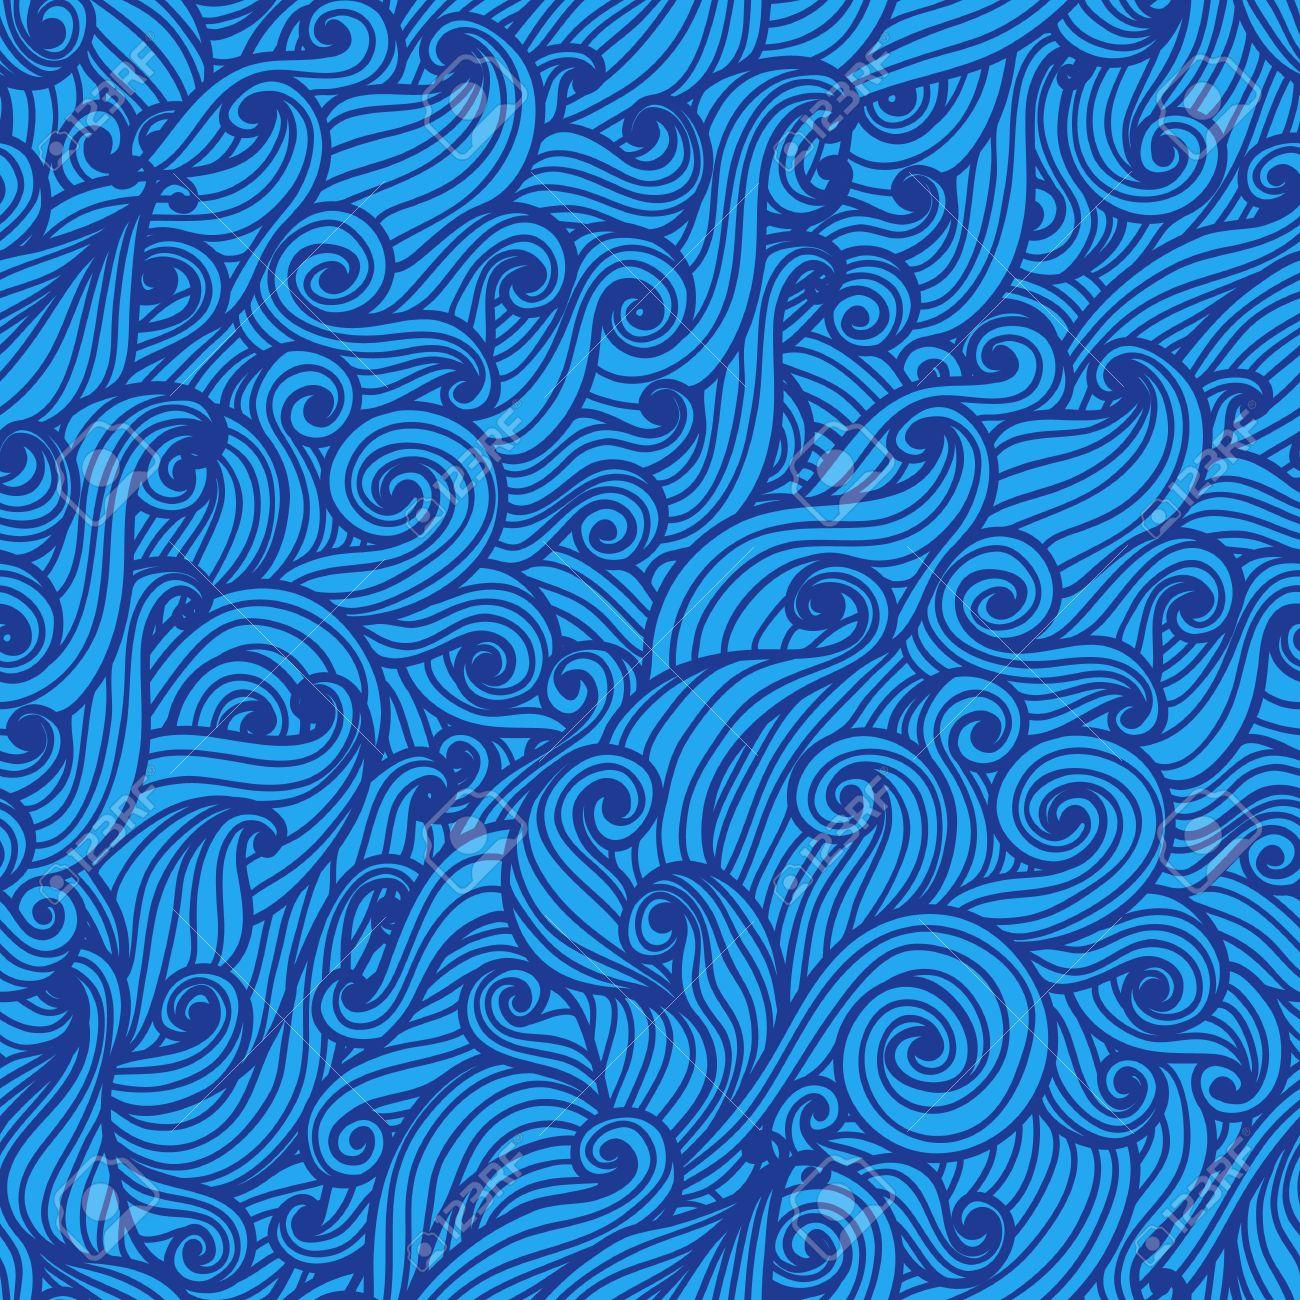 . Wavy seamless pattern  Hand drawn curly background  Modern wallpaper